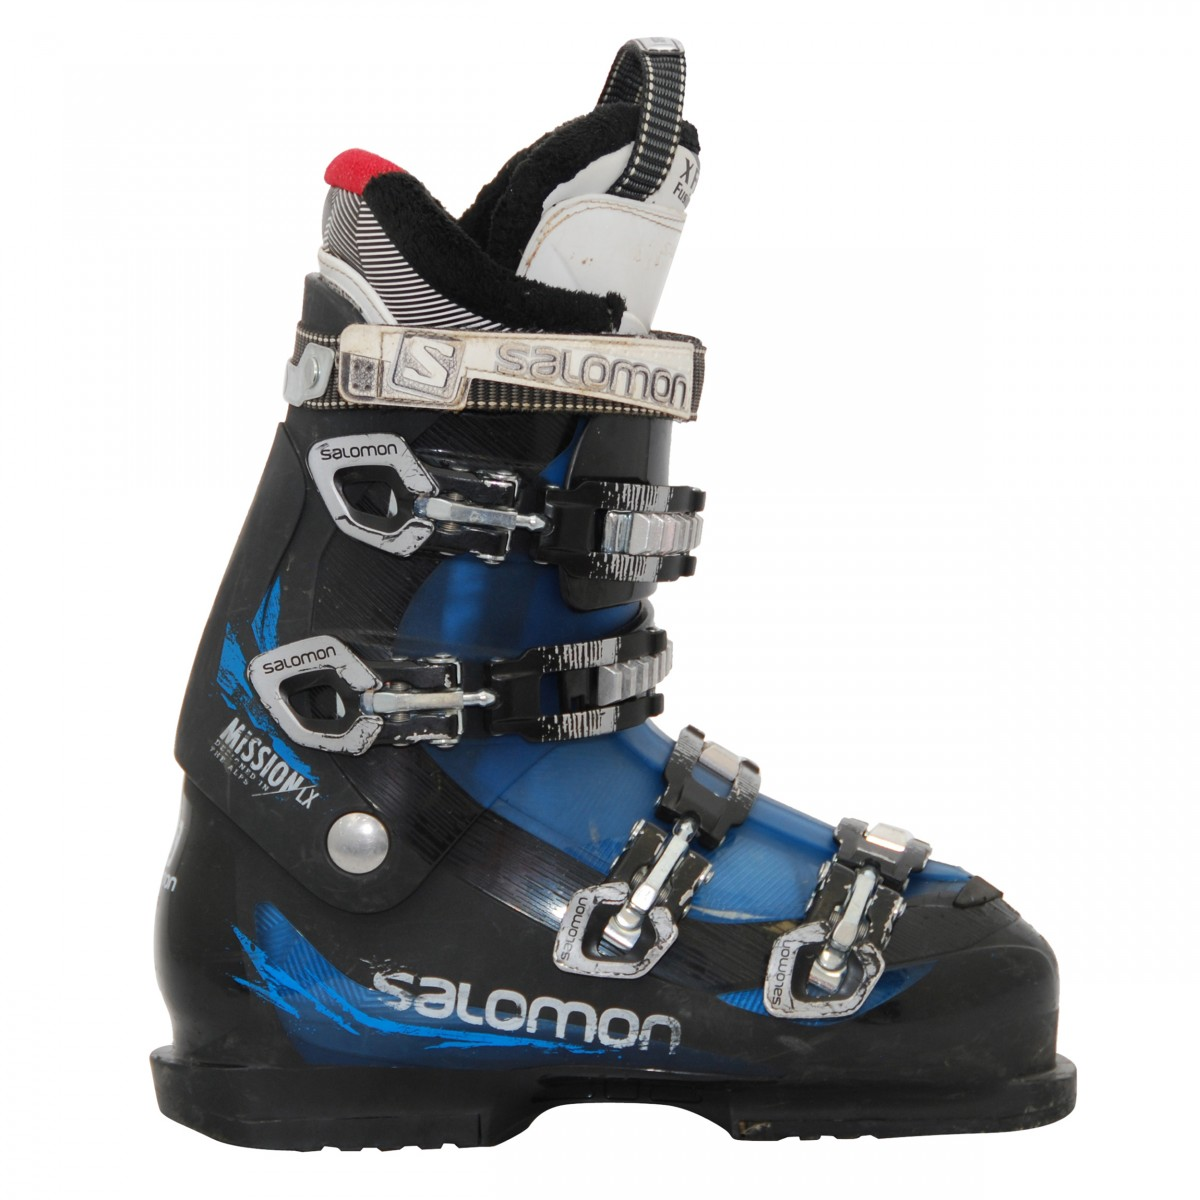 Chaussures Ski Salomon Mission d'occasion